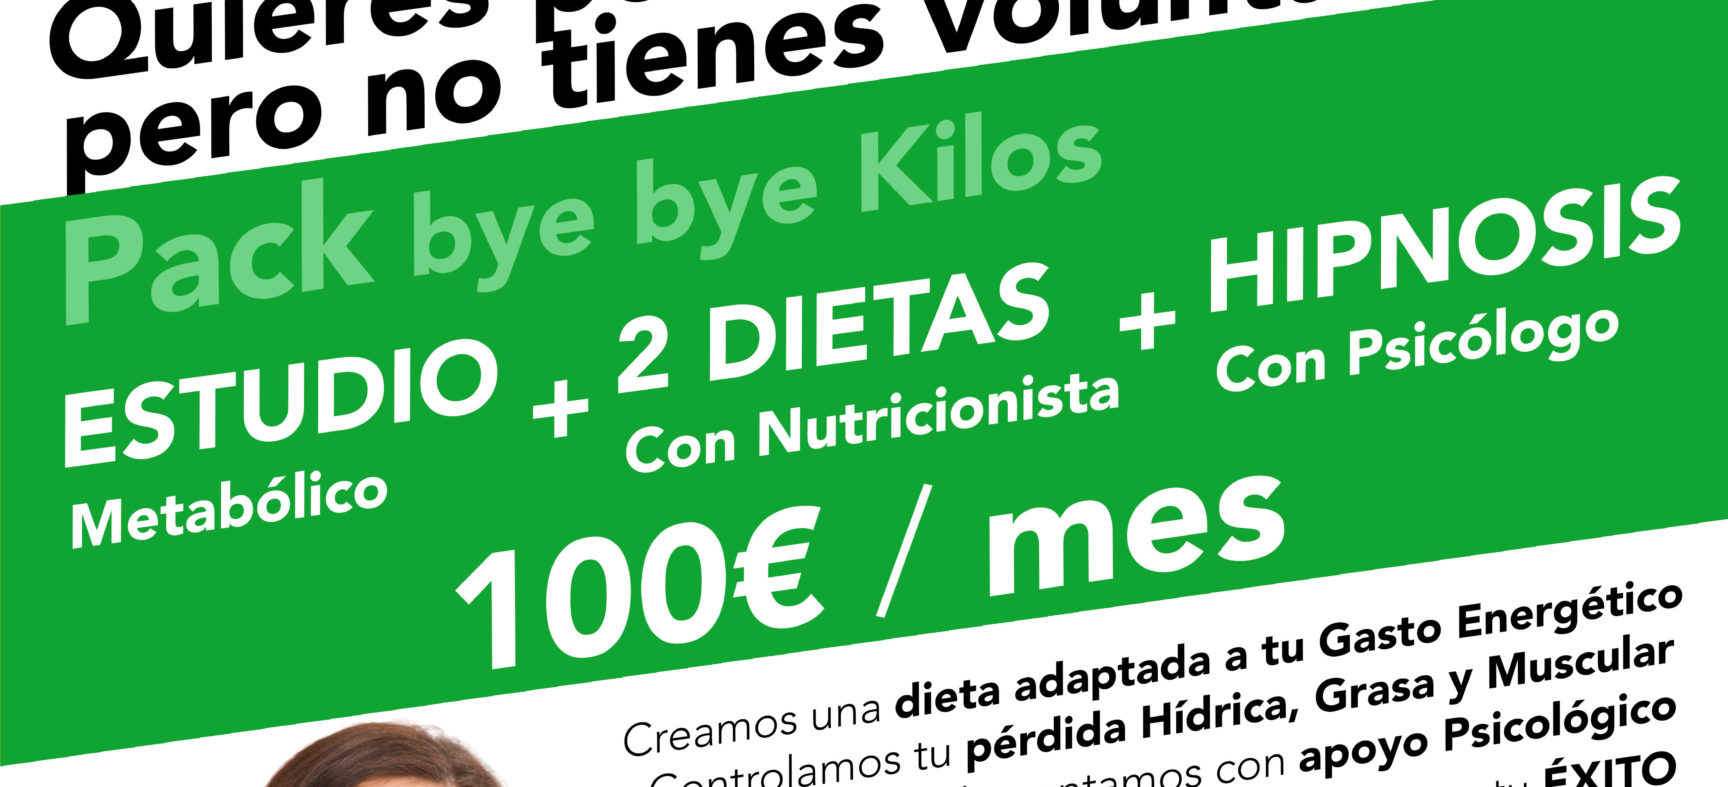 HIPNOSIS CLÍNICA CON PSICÓLOGO + CONSULTA DIETÉTICA + PRESOTERAPIA